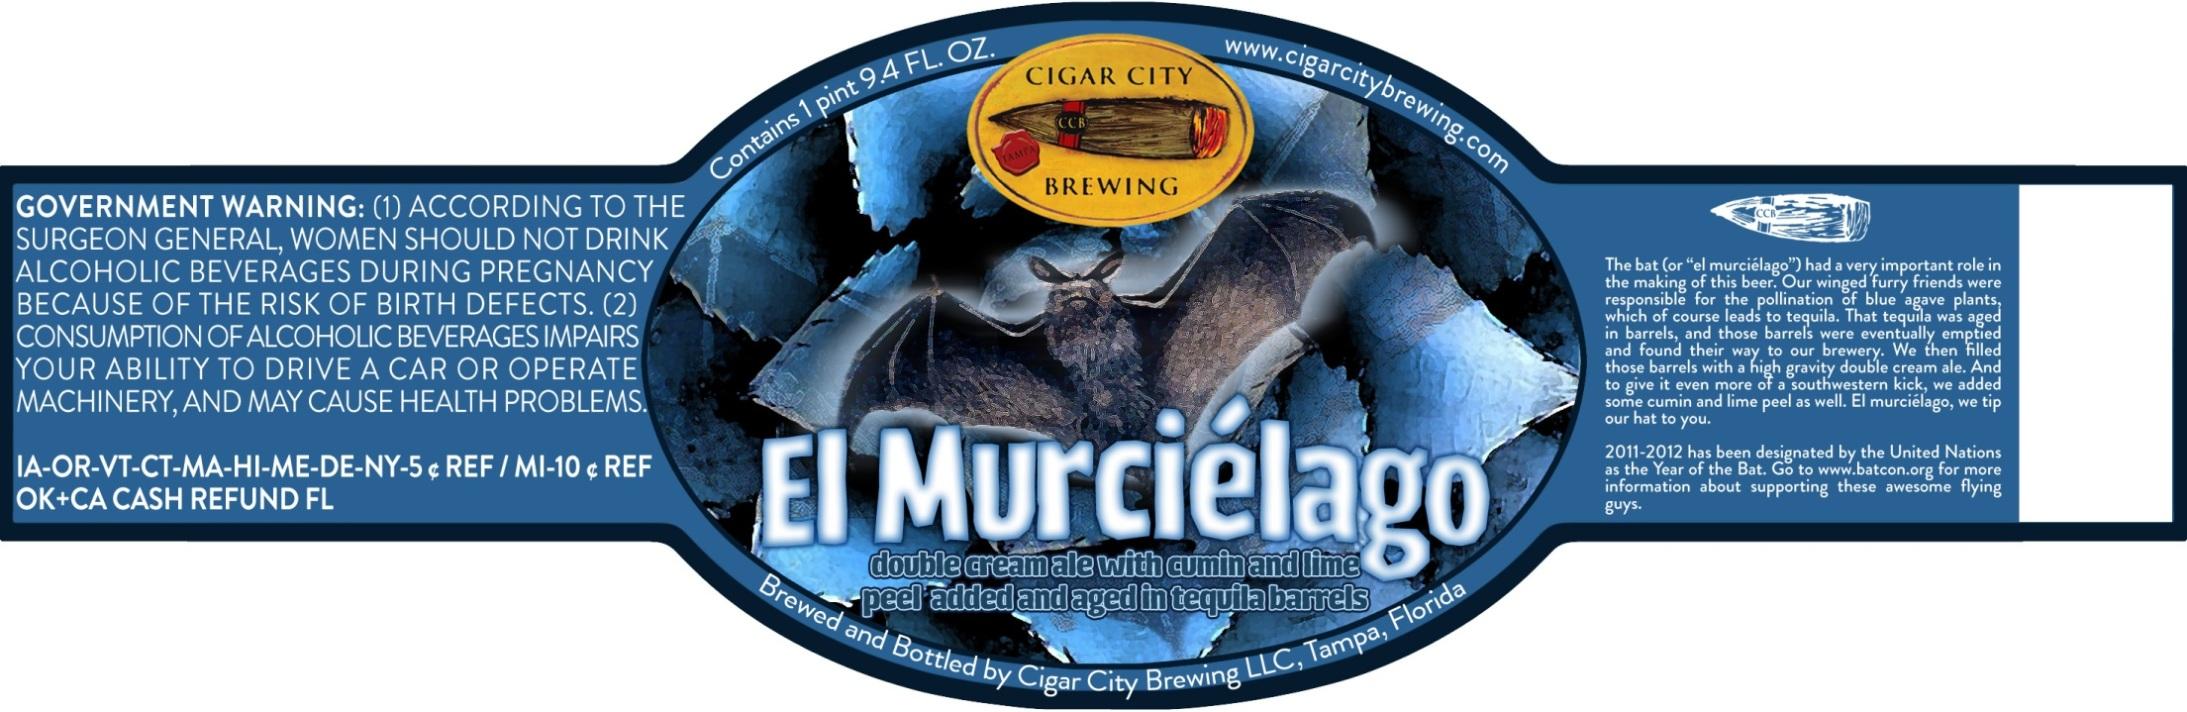 Cigar CIty El Murcielago